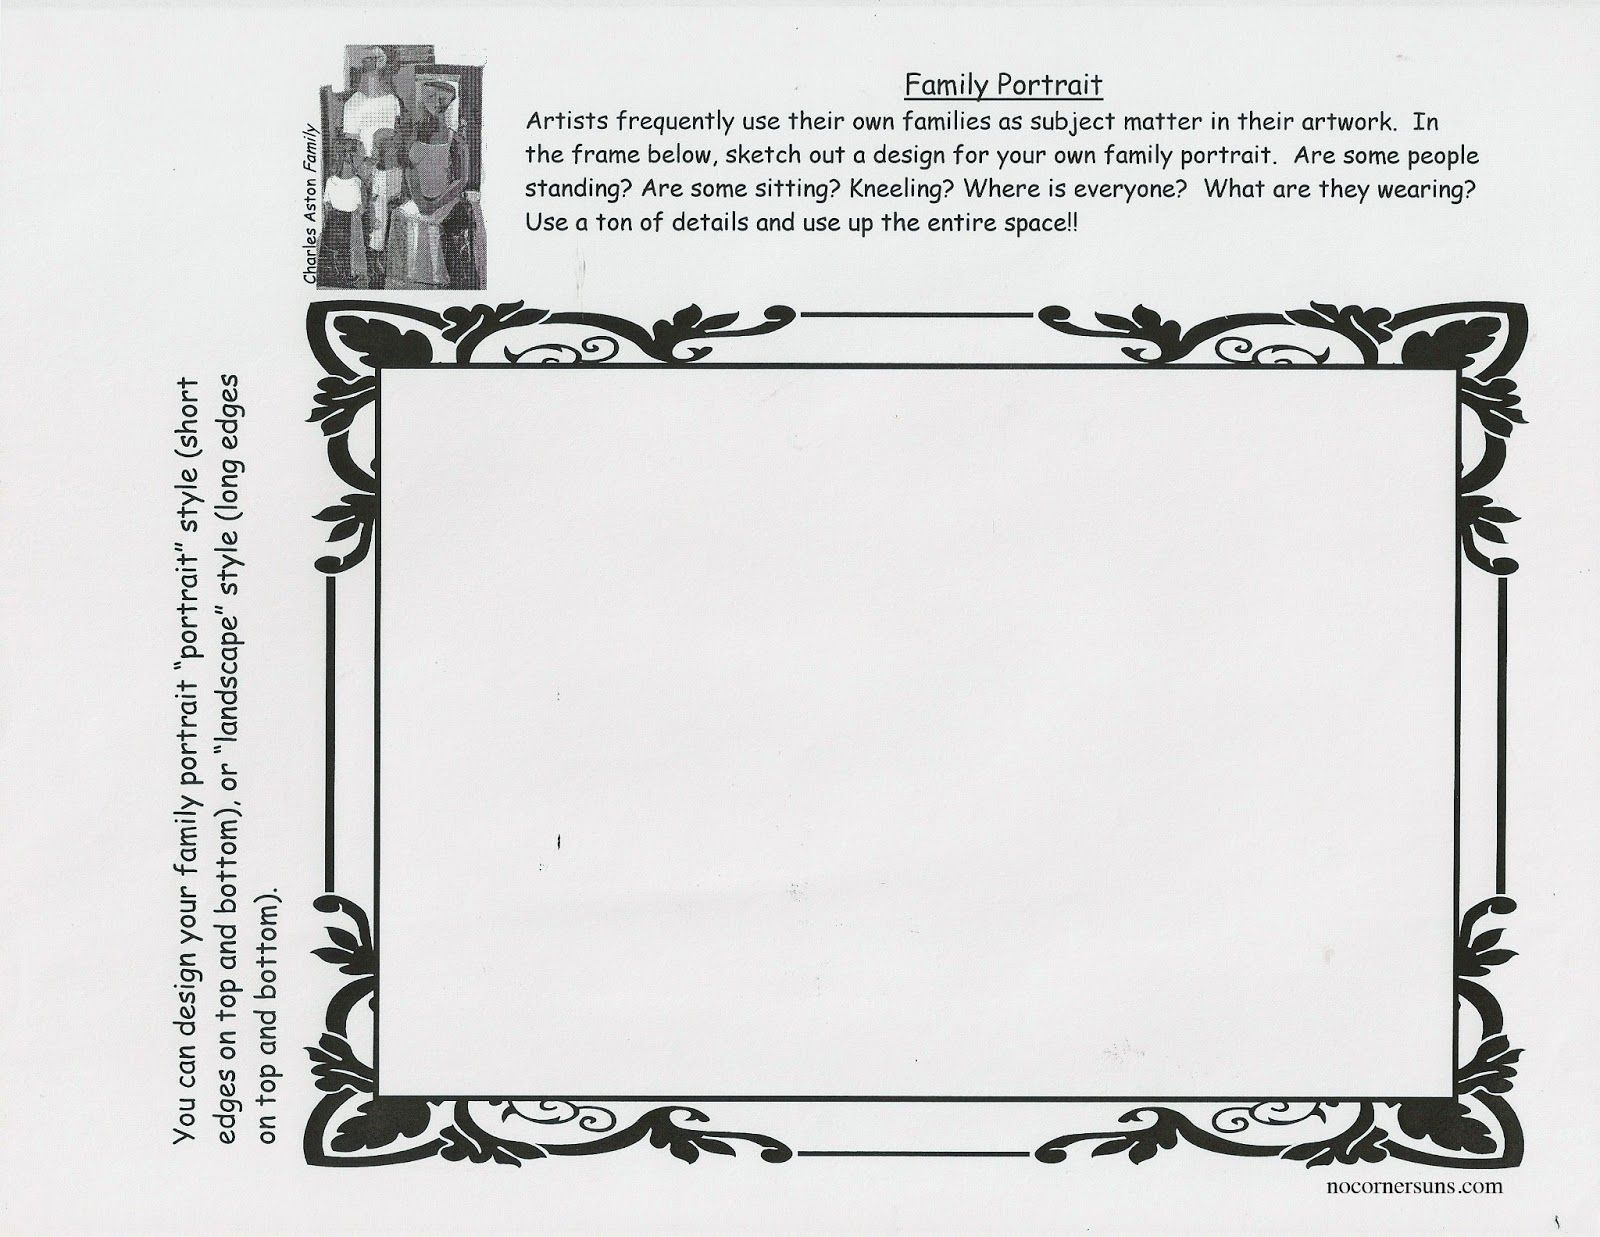 medium resolution of No Corner Suns: Family Portrait Worksheet and Sculpture Handout   Art  worksheets